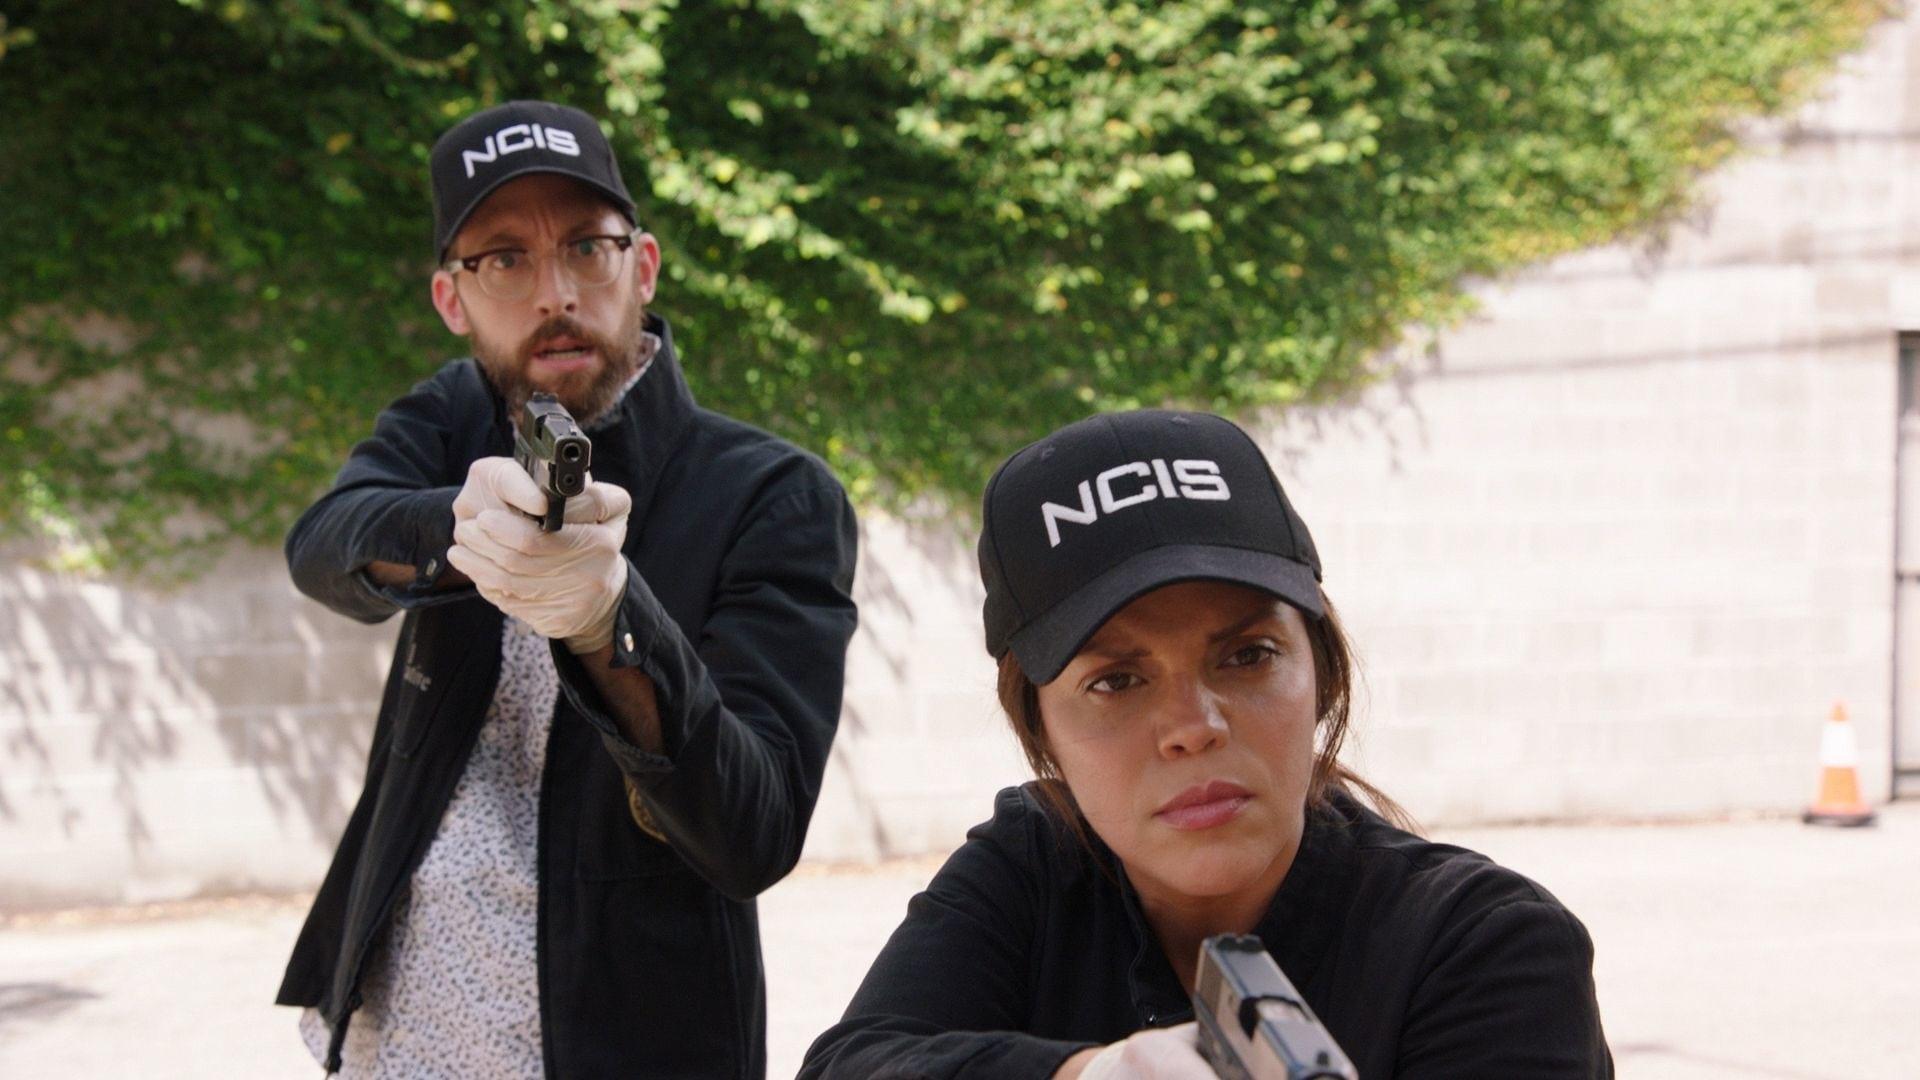 ncis season 5 episode guide